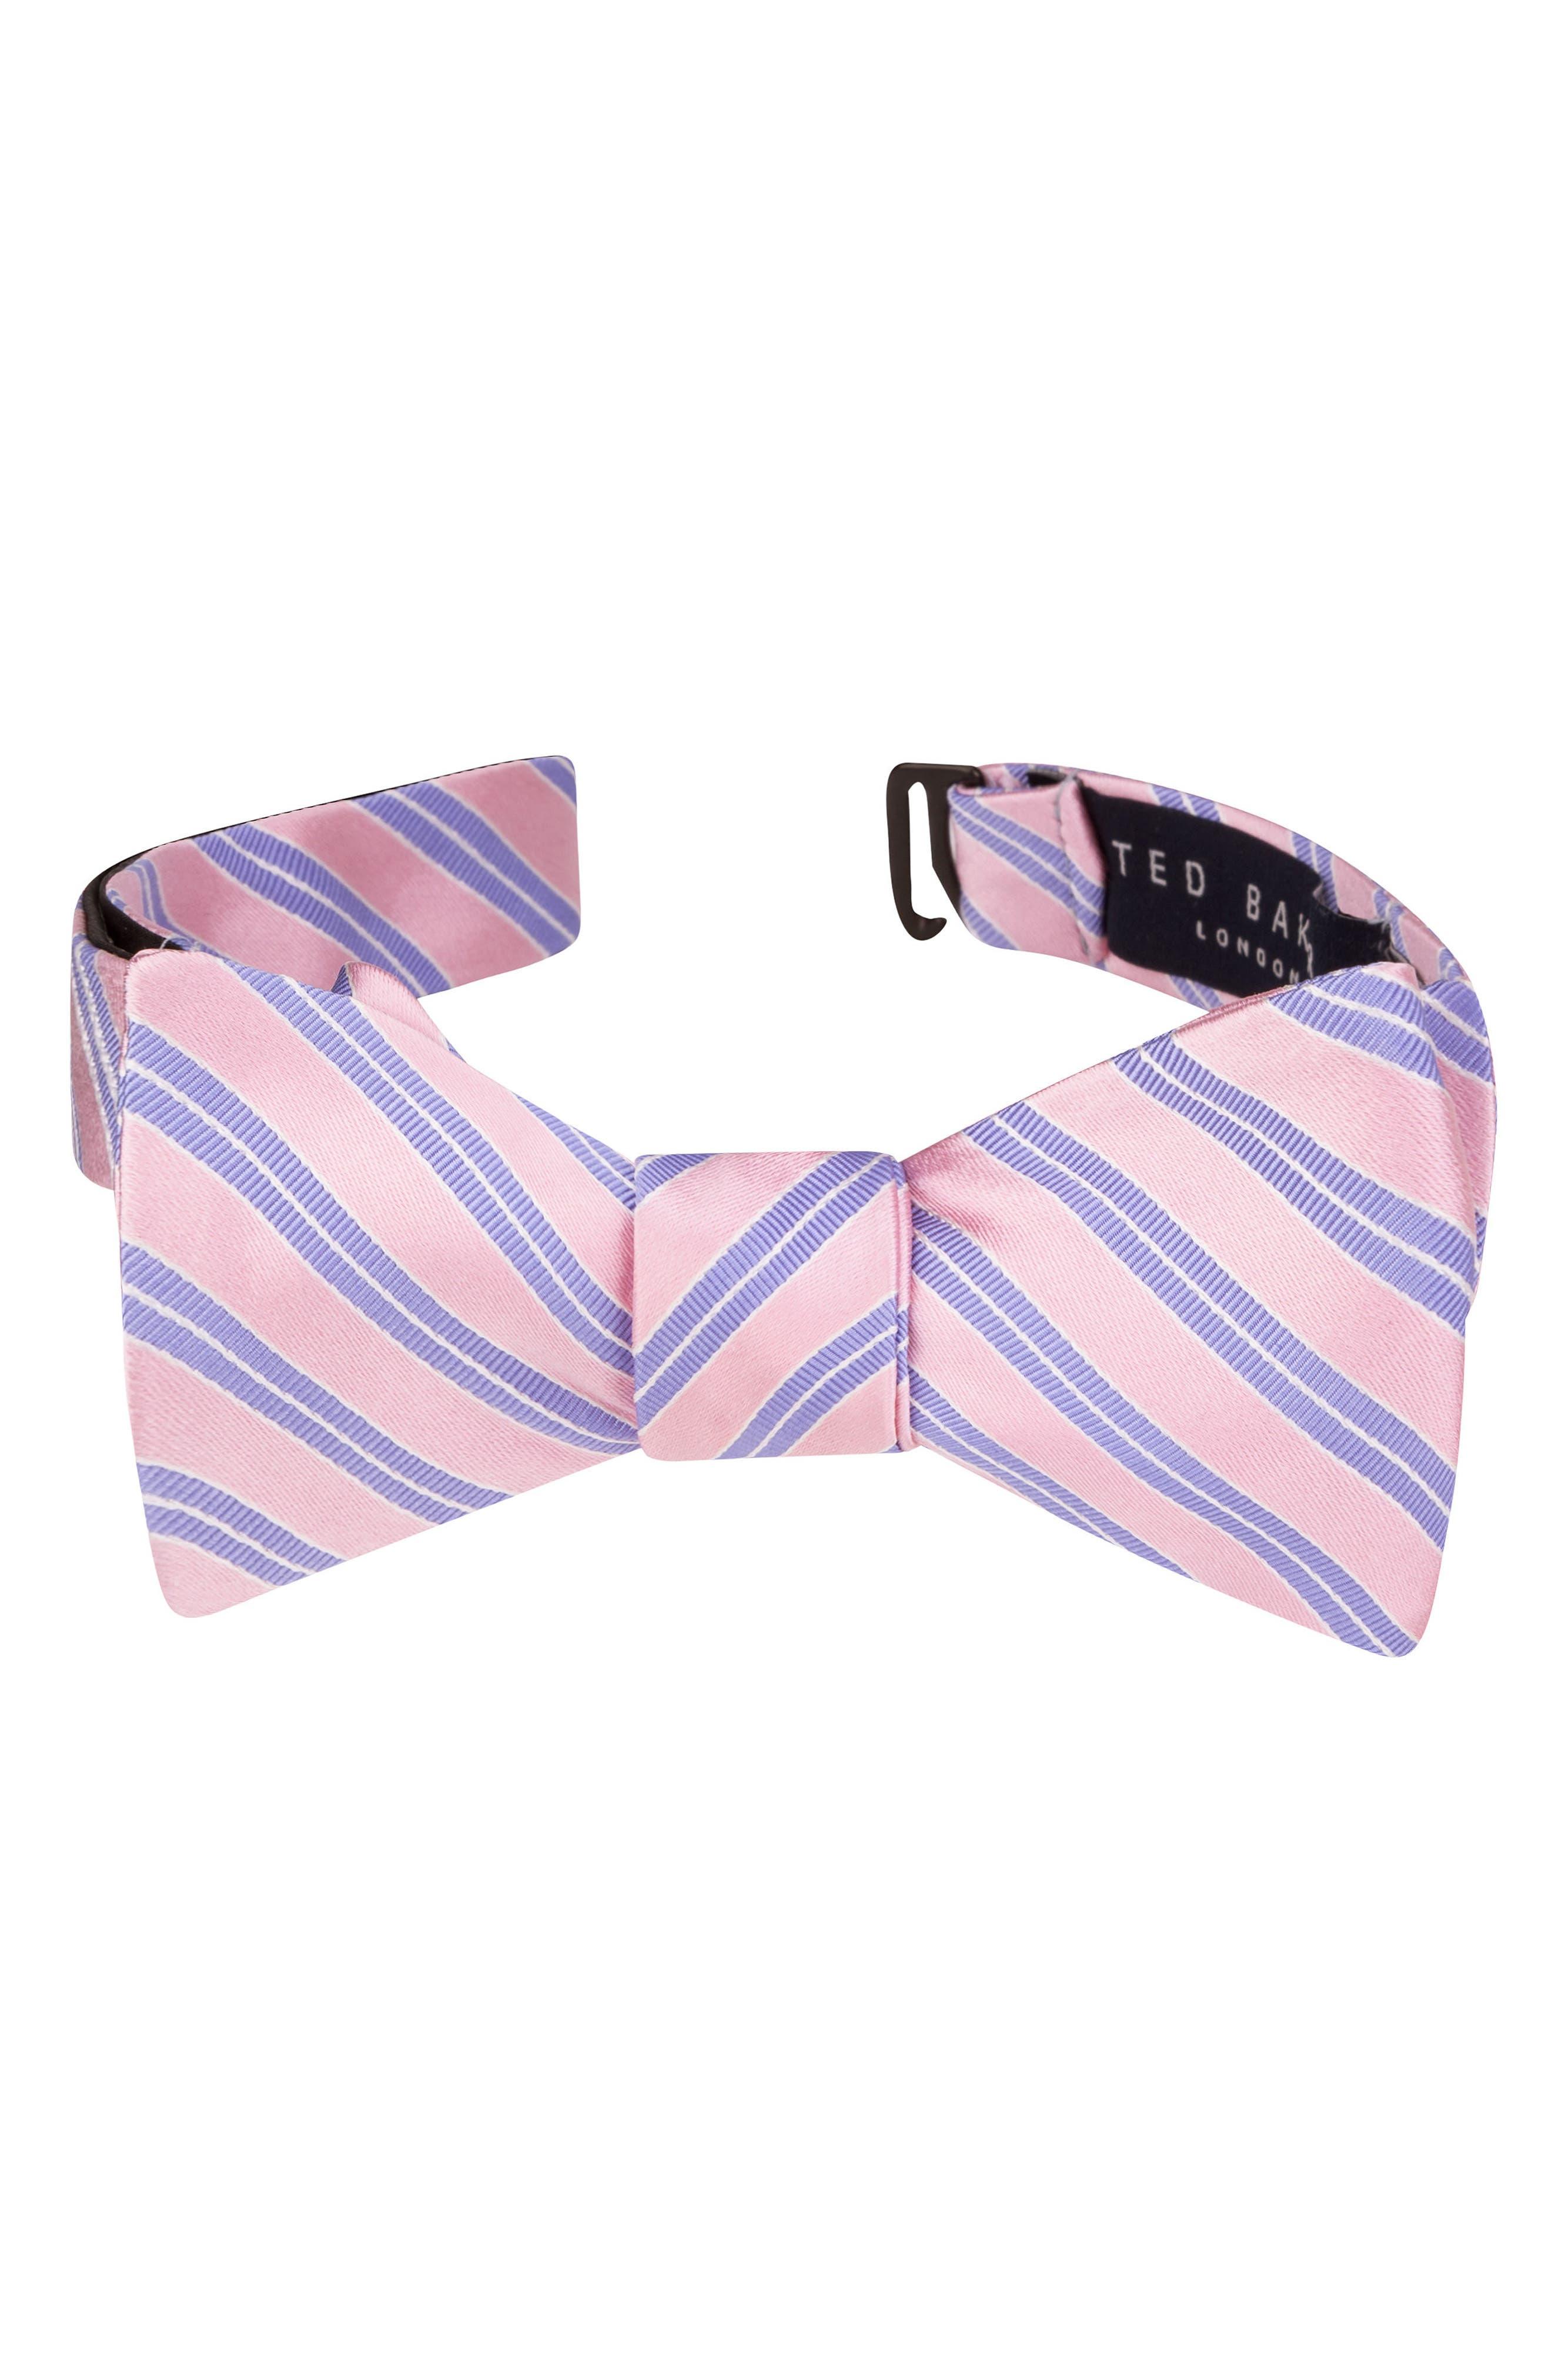 TED BAKER LONDON Stripe Silk & Cotton Bow Tie